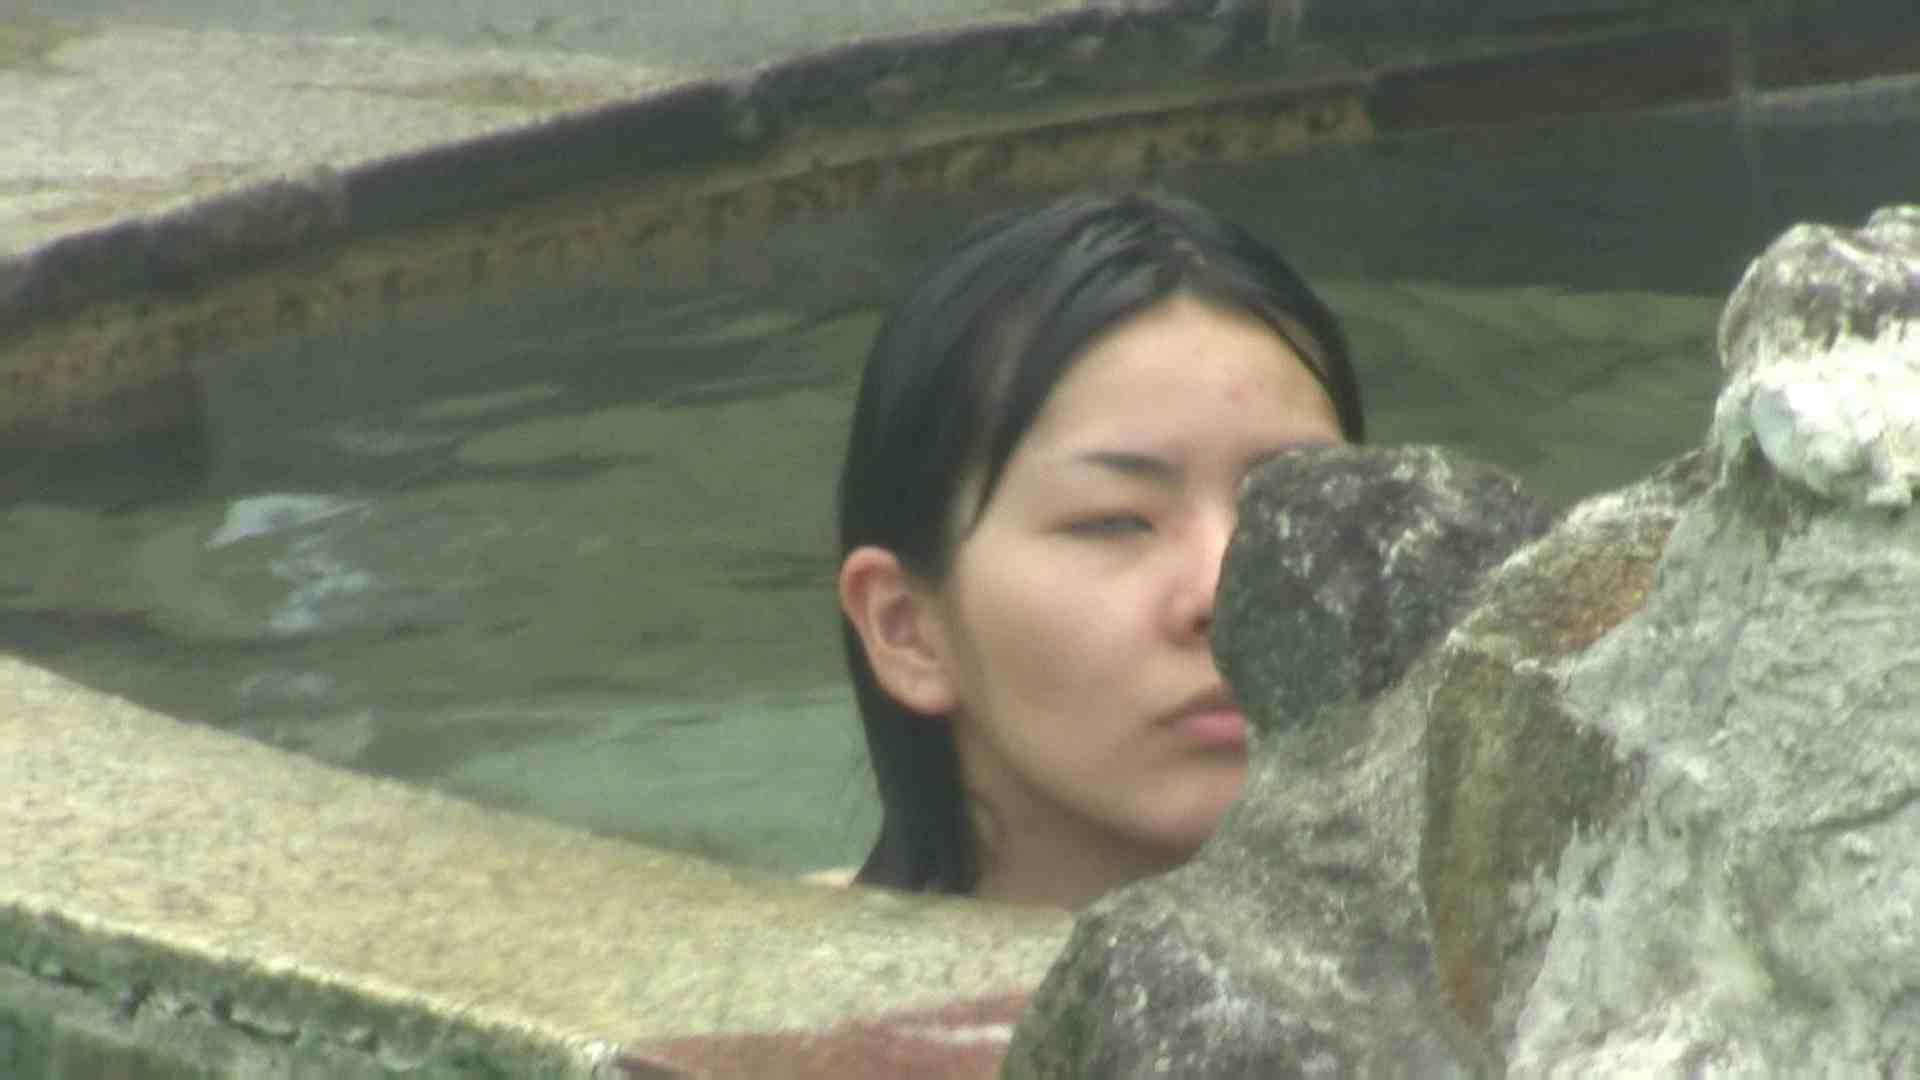 高画質露天女風呂観察 vol.040 望遠映像 すけべAV動画紹介 94PIX 59